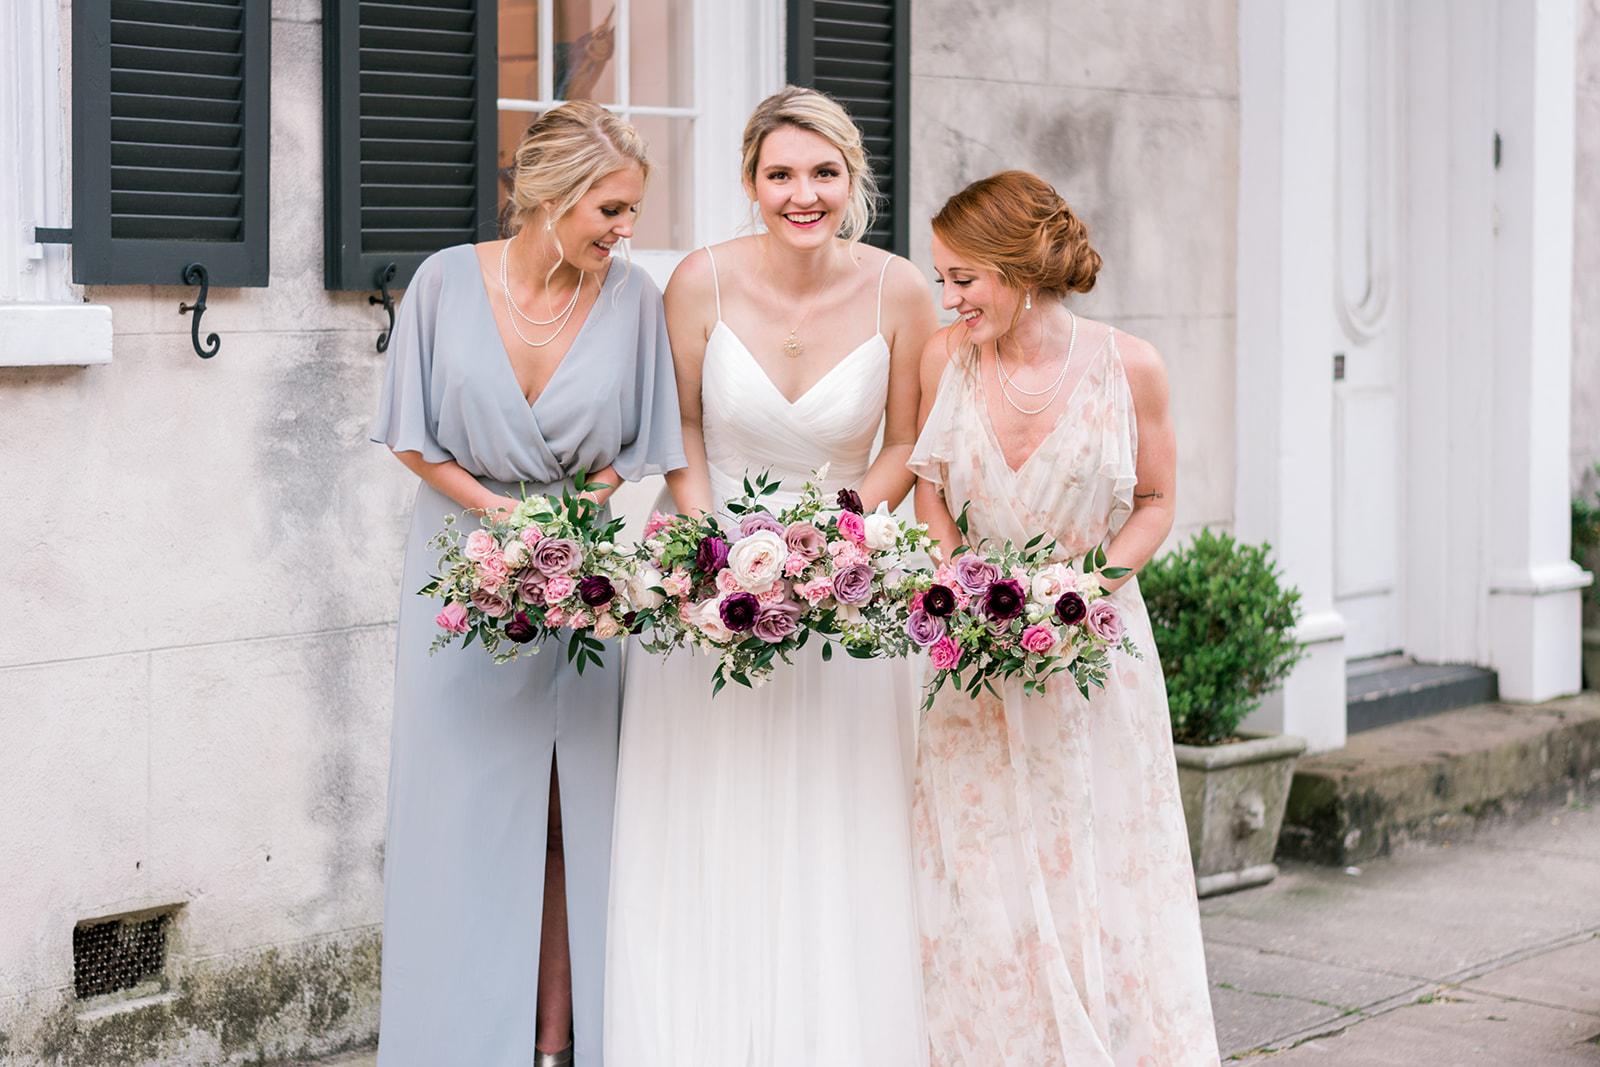 losing-weight-for-your-wedding-tips-bridal-guide-wedding-weight-loss-ivory-and-beau-savannah-bridal-shop-rebecca-ingram-wedding-dress-jenny-yoo-floral-bridesmaids-dresses.jpg